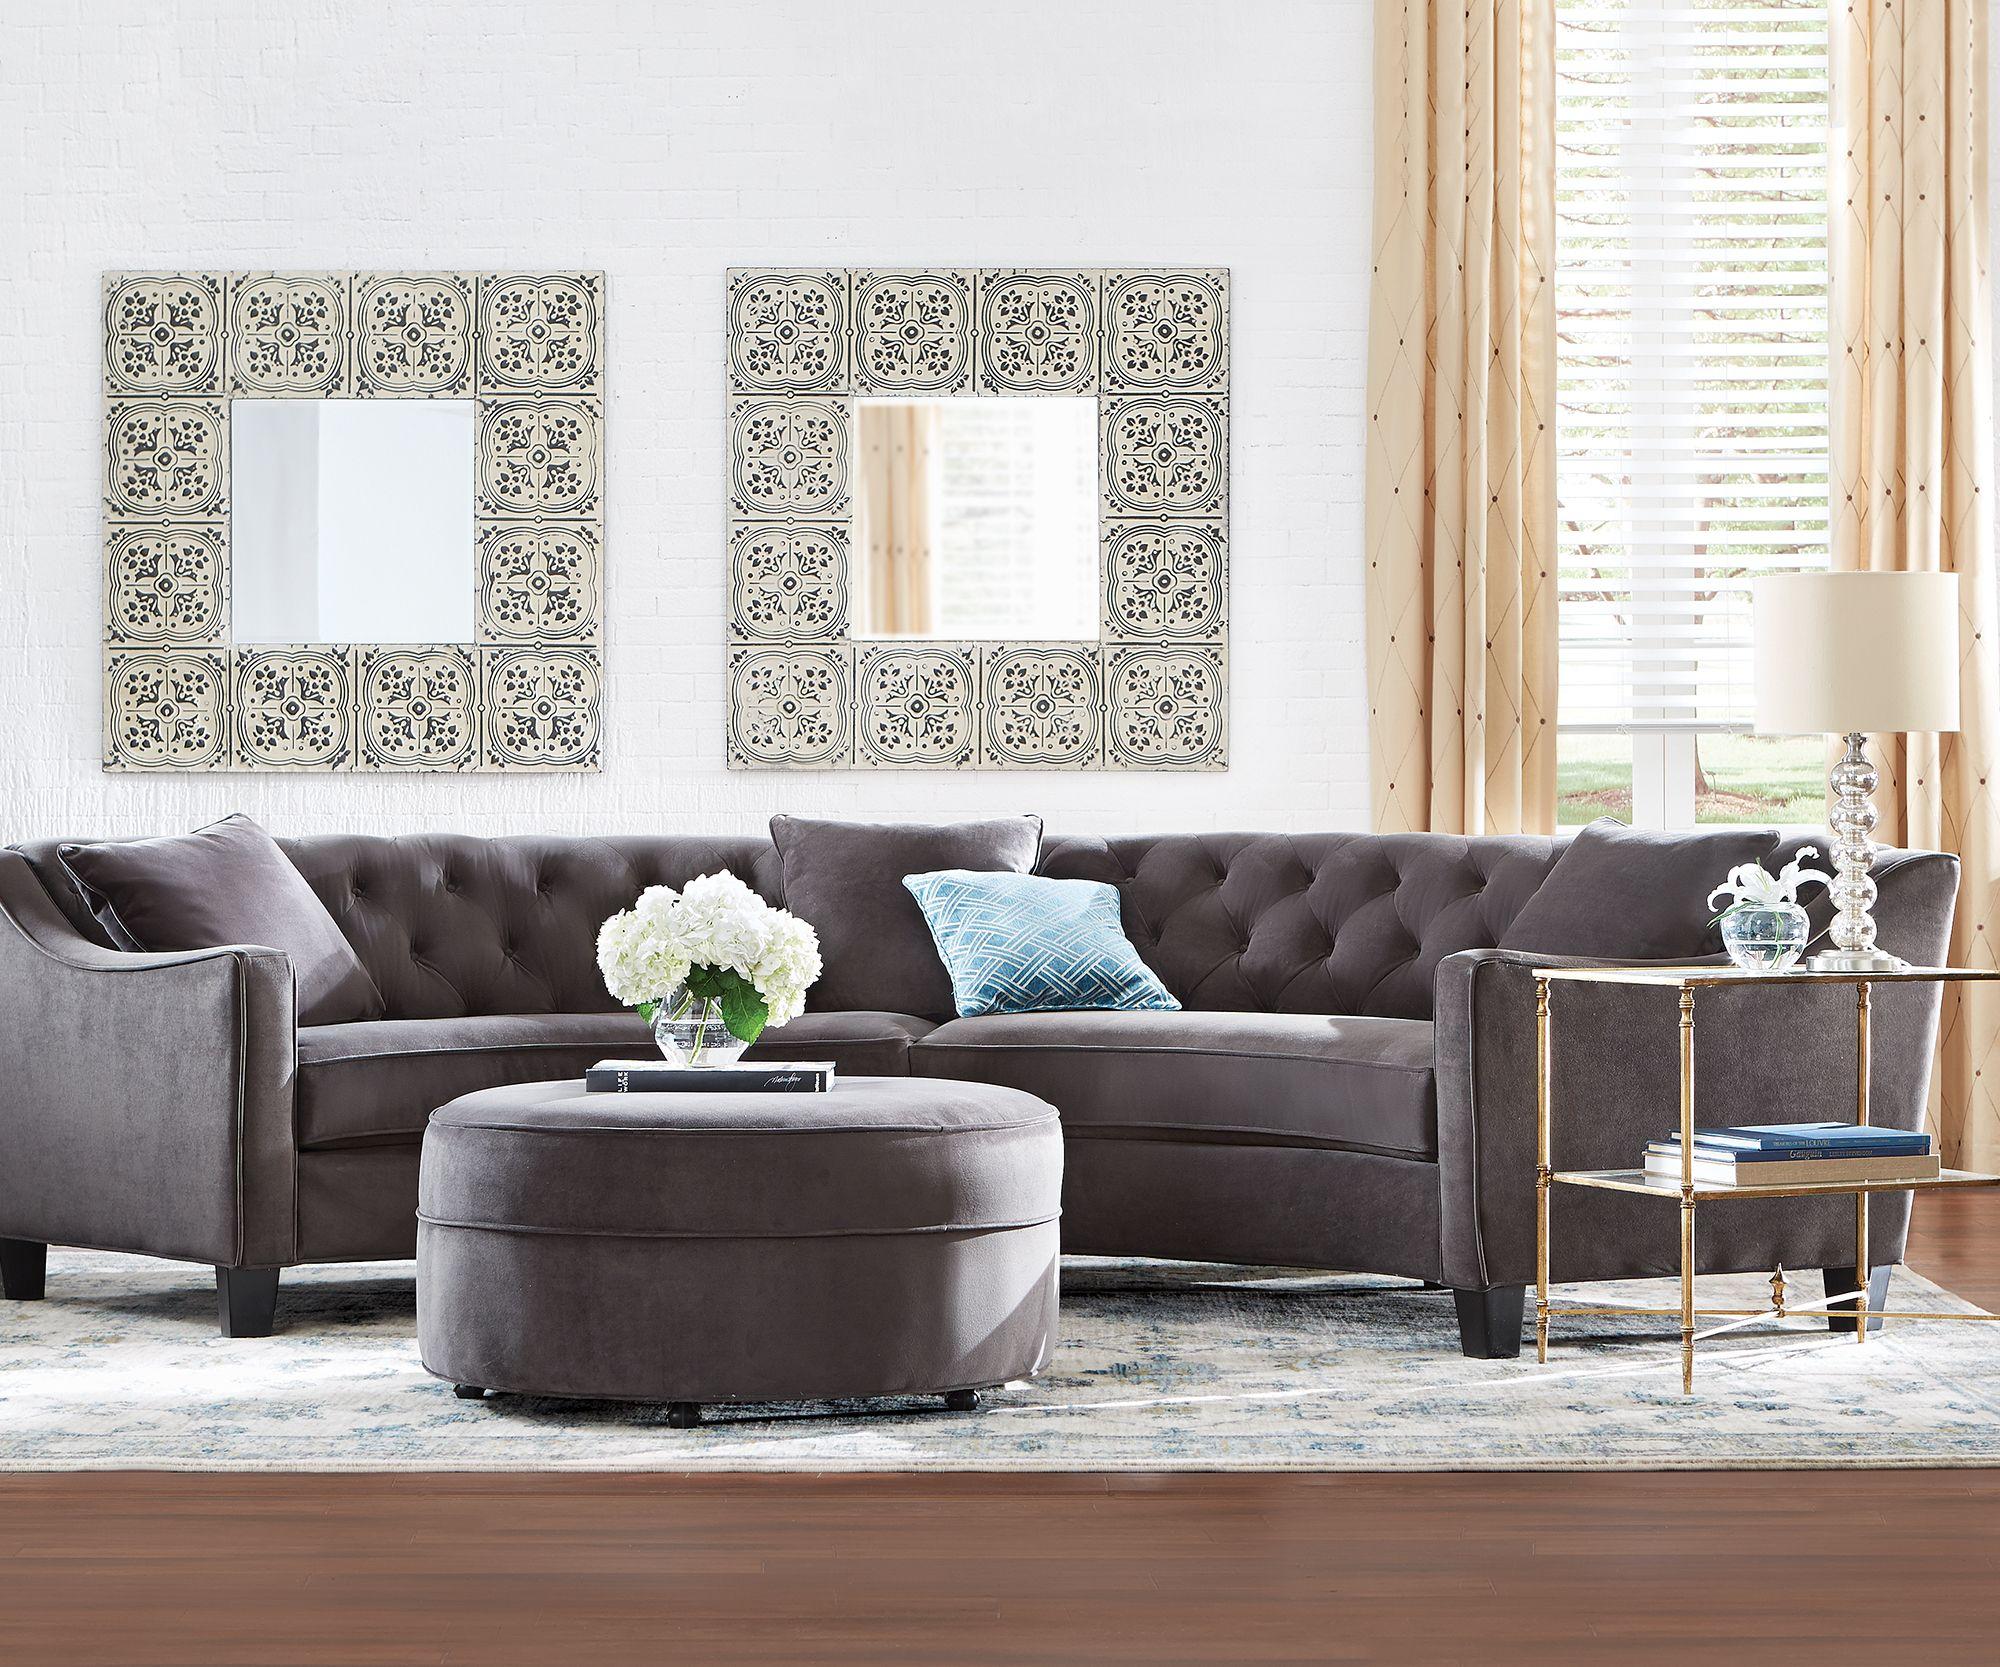 Unique Sofas: A Glamourous Curved Sofa Offers A Unique Shape. A Perfect